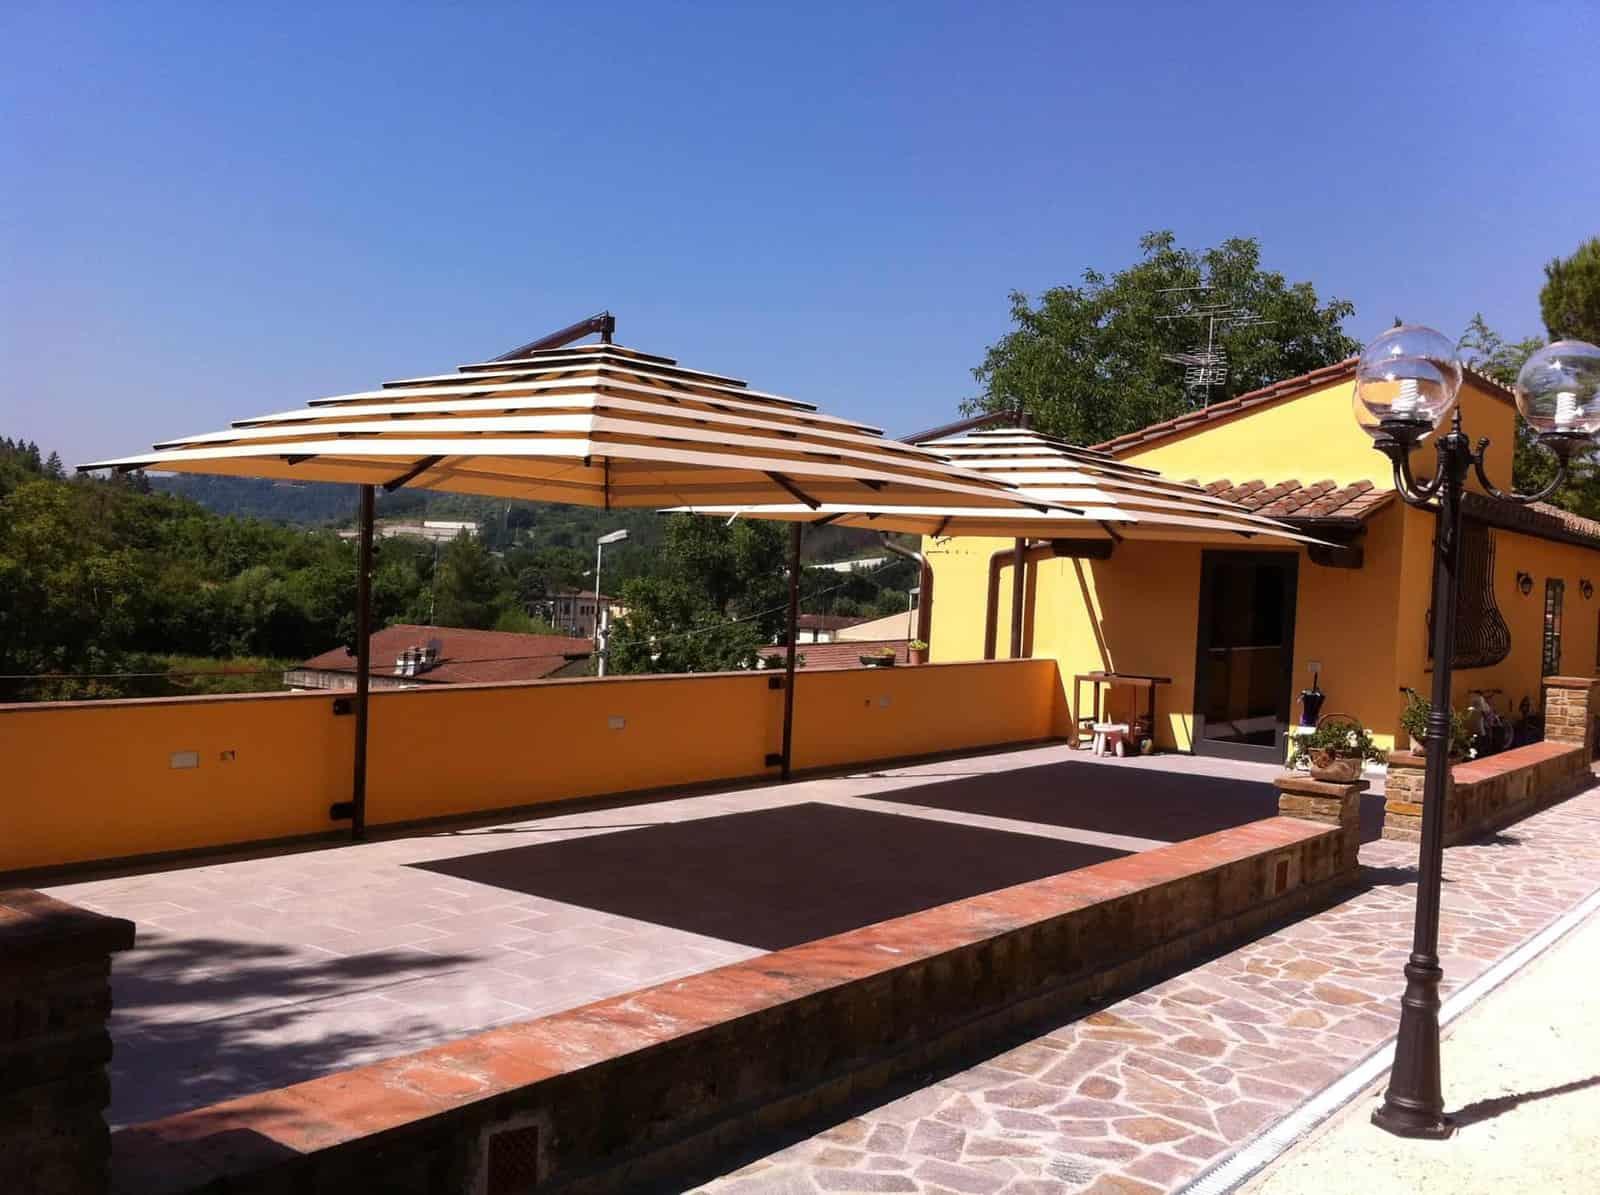 Parasol de jardin luxe haut de gamme   Fixation murale